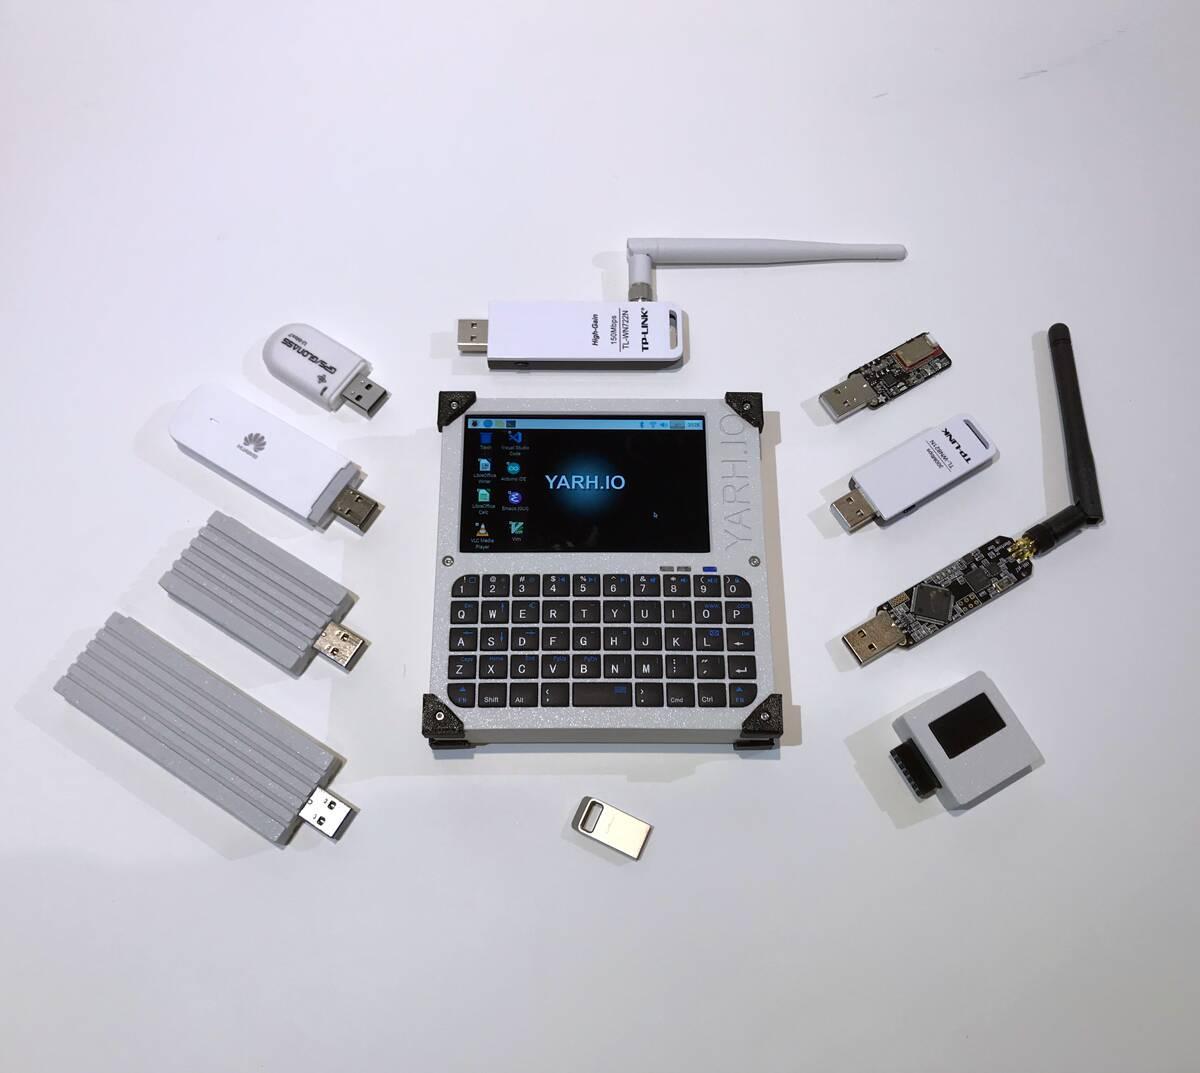 YARH.IO Micro 2